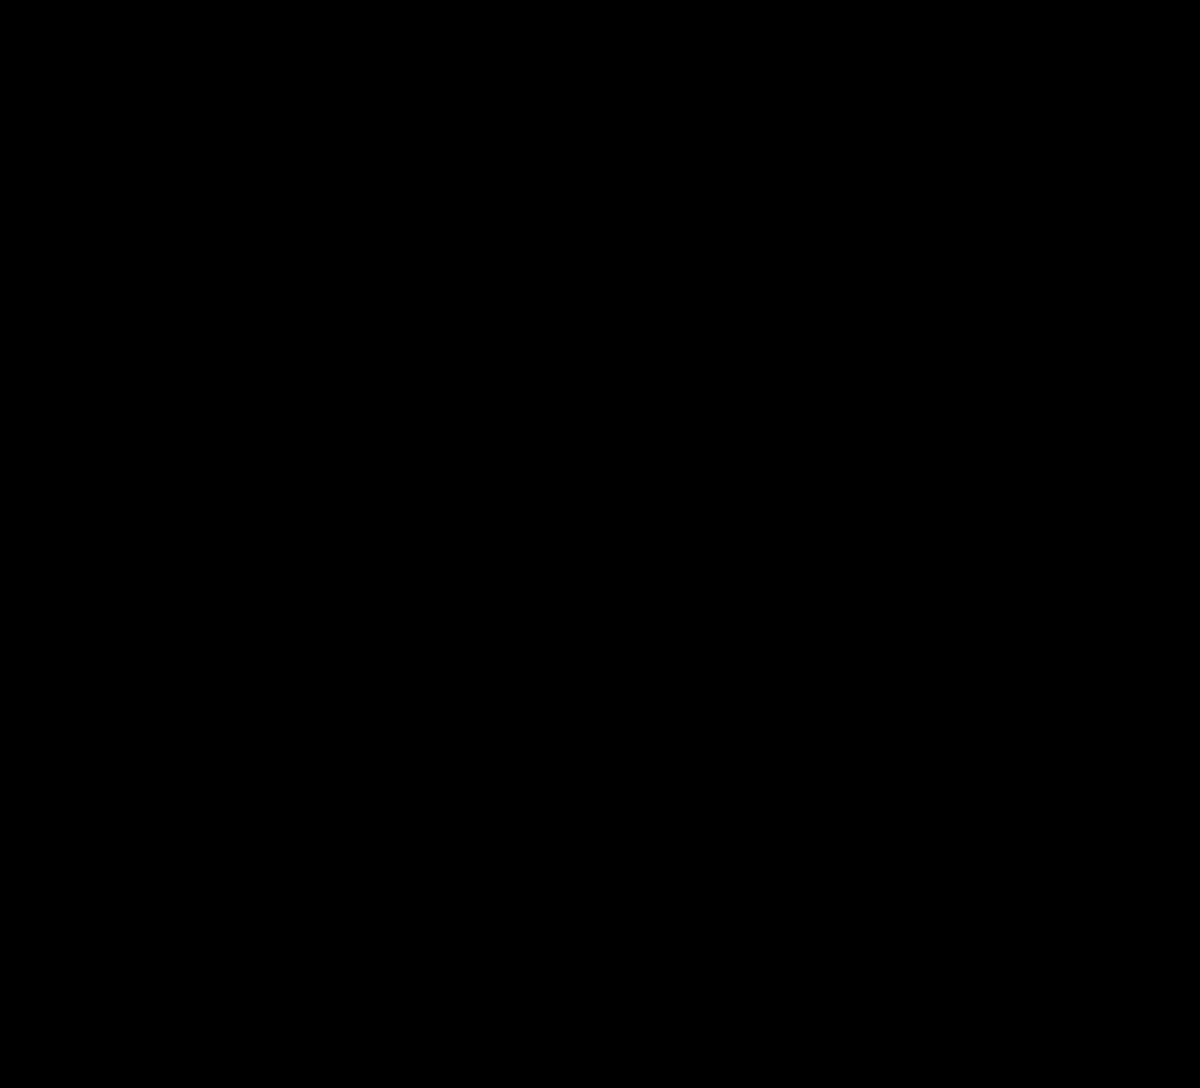 Fietsspiegel armband 360º roterend- achteruitkijkspiegel fiets – mountainbike accessoires – fietsspiegelpolsband – fiets armspiegel